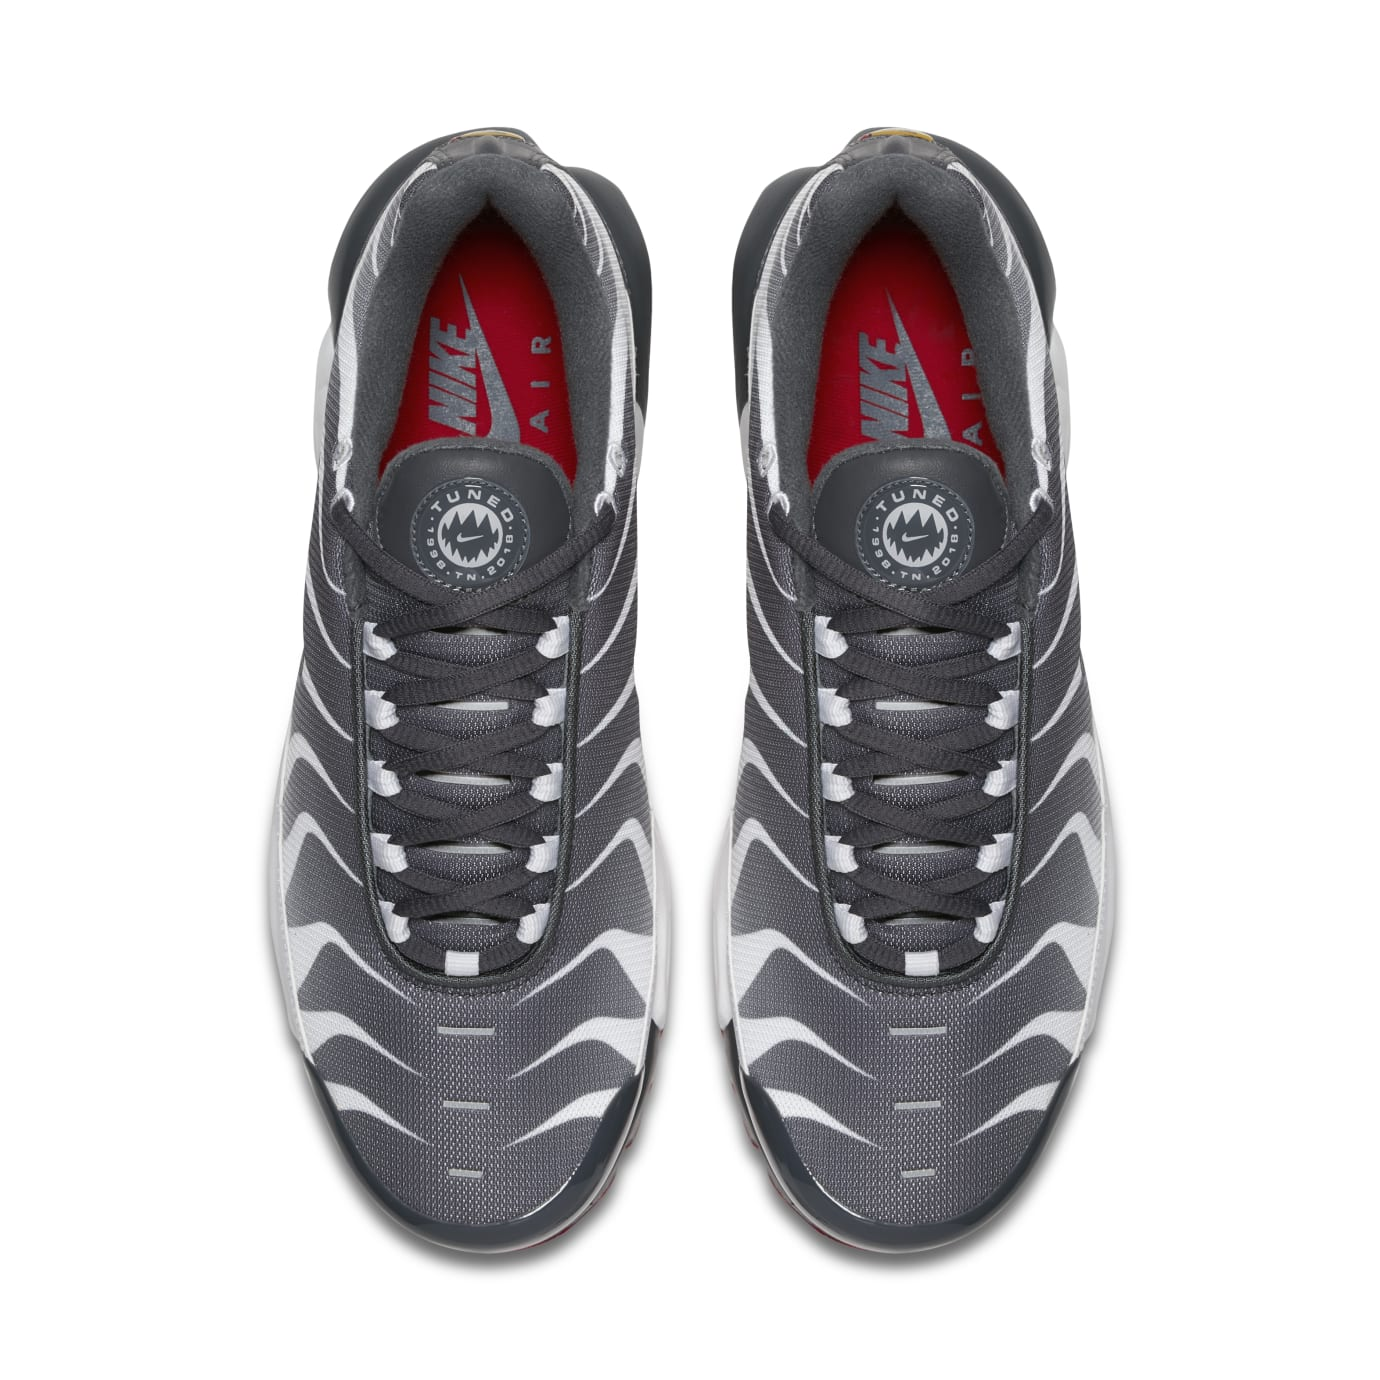 Nike Air Max Plus 'Before the Bite' (Top)